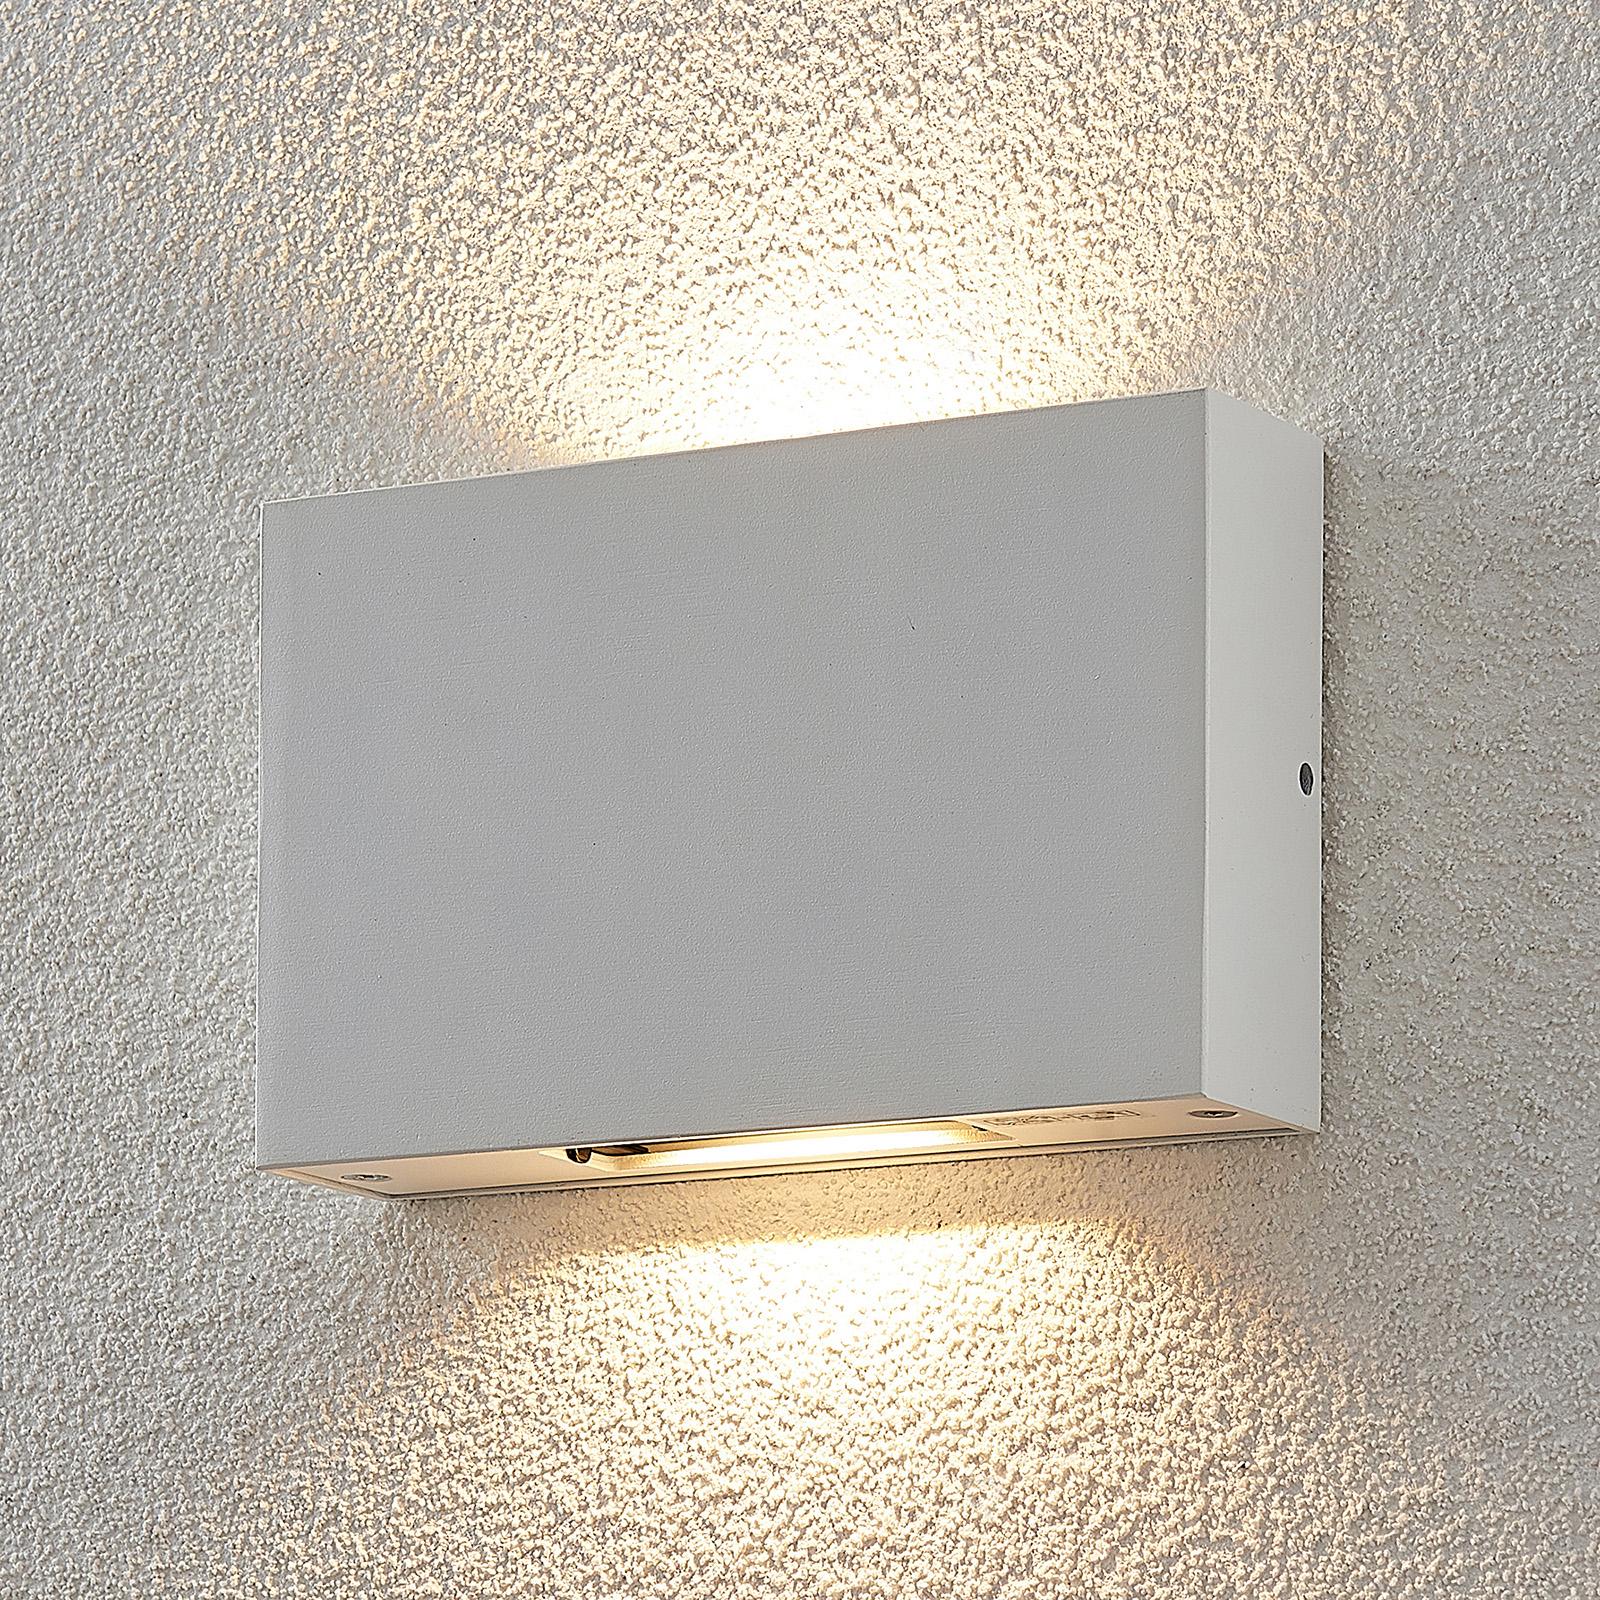 Applique d'extérieur LED Katla en aluminium